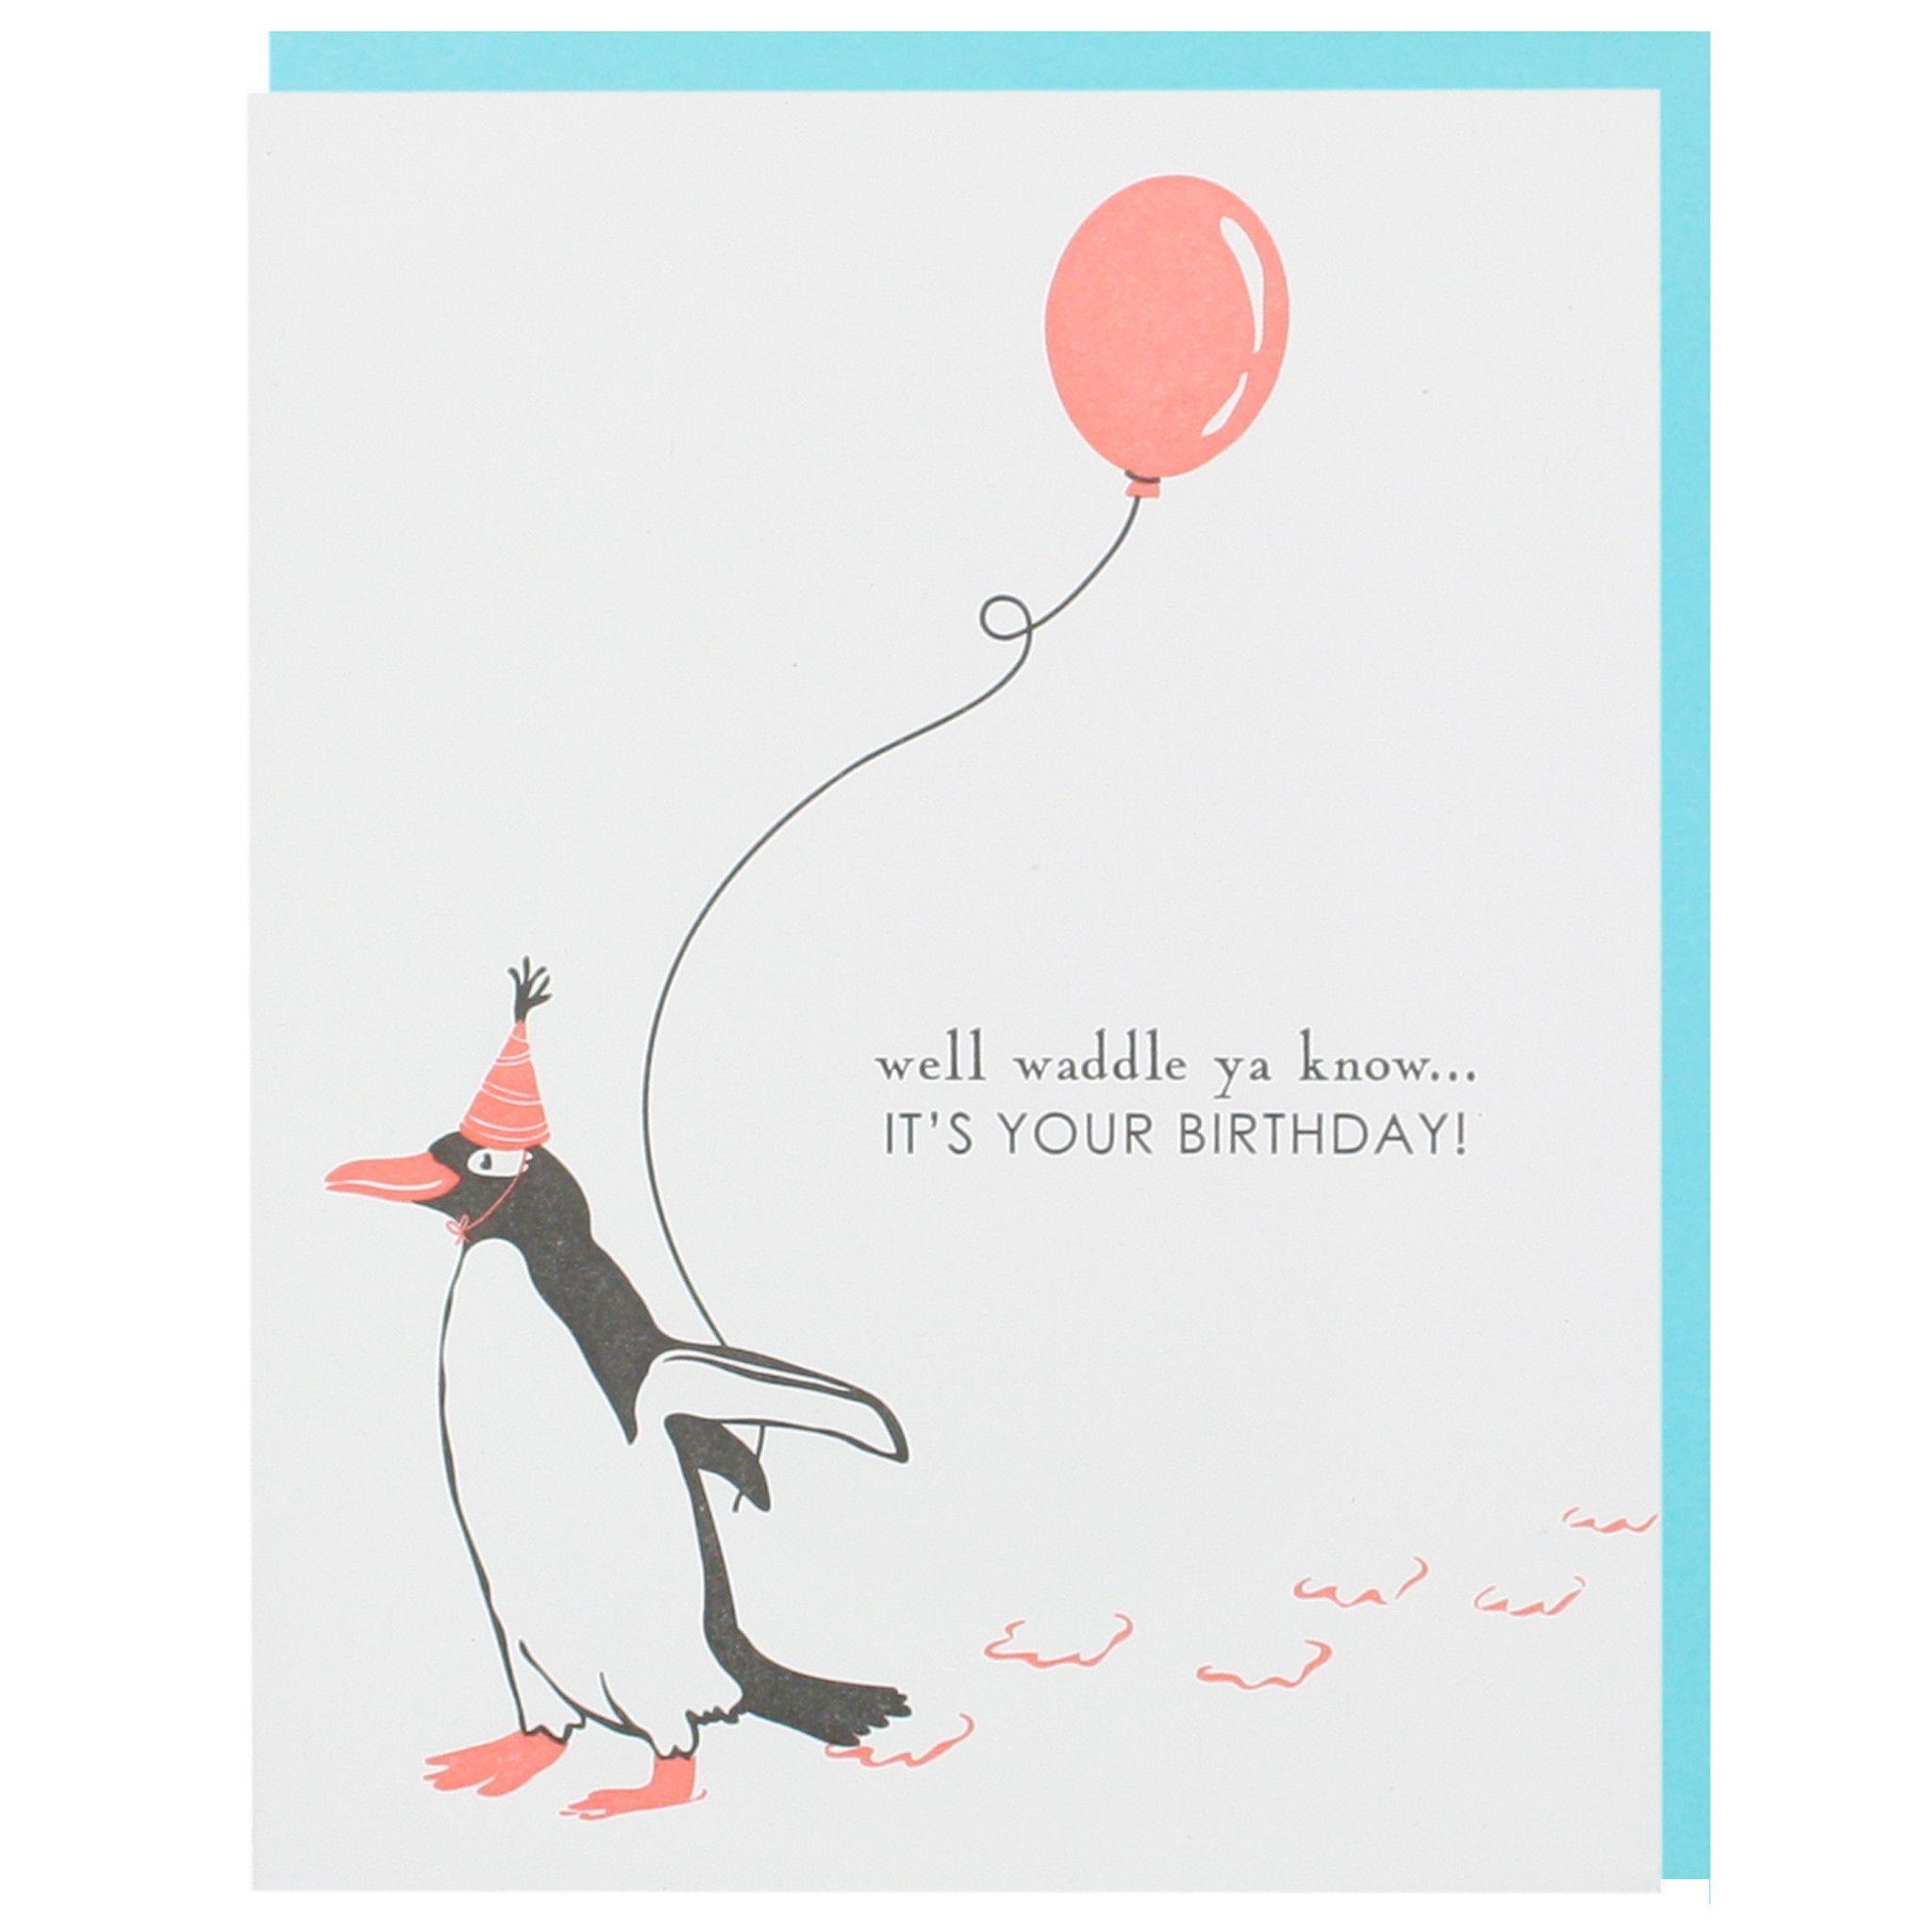 Penguin With Balloon Birthday Card Birthday Cards Happy Birthday Cards Cards